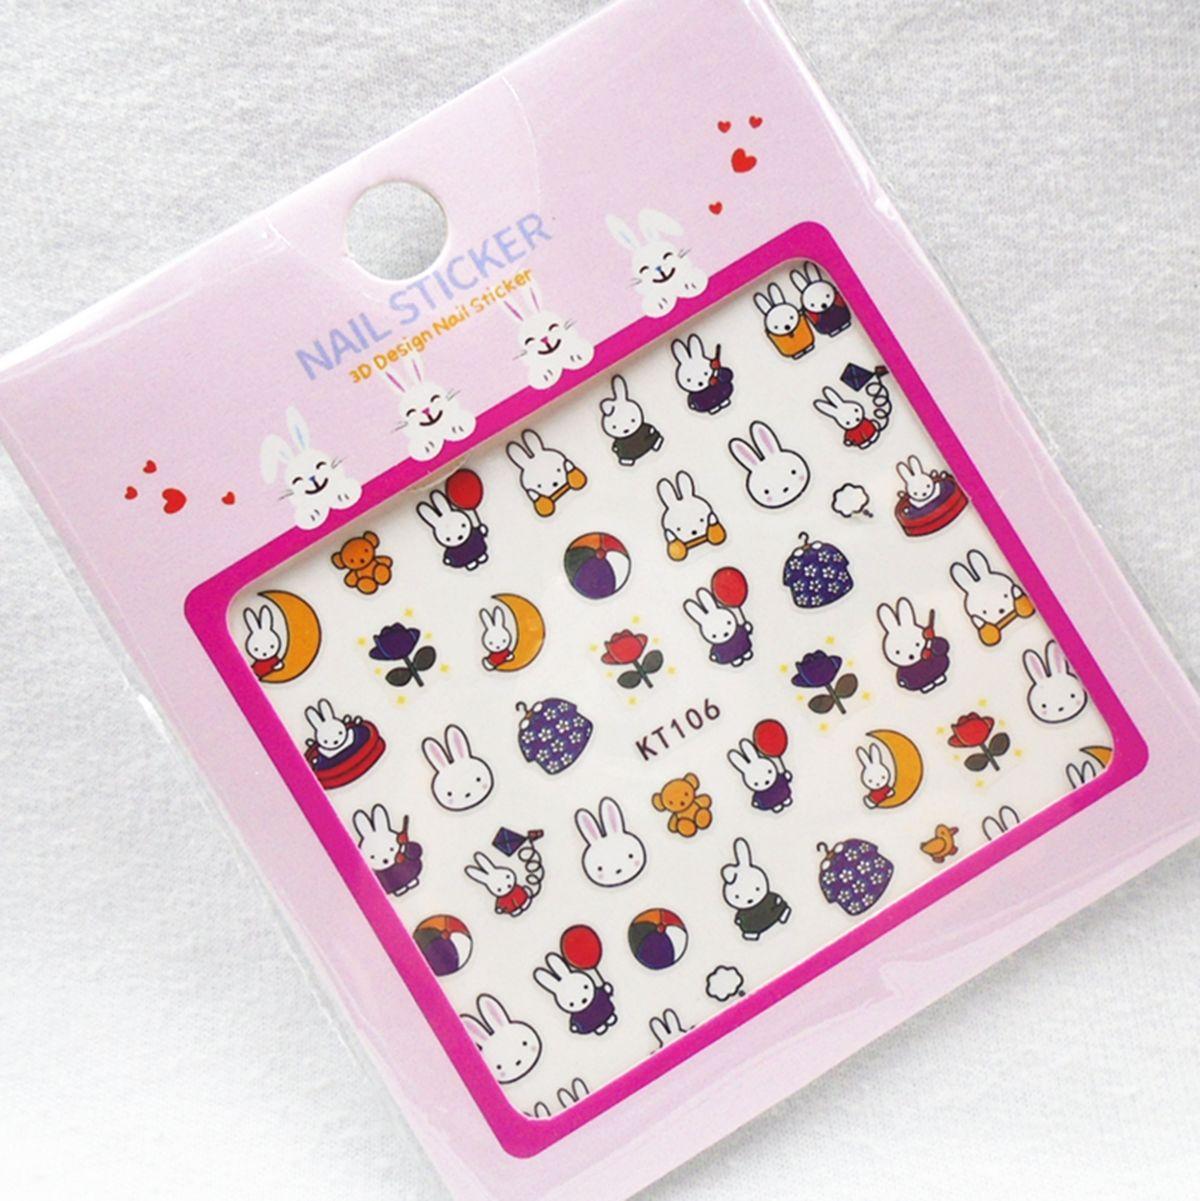 Kt106-125 New Style Children Nail Sticker Manicure Flower Stickers Hot Sales I Little Duck Nail Sticker